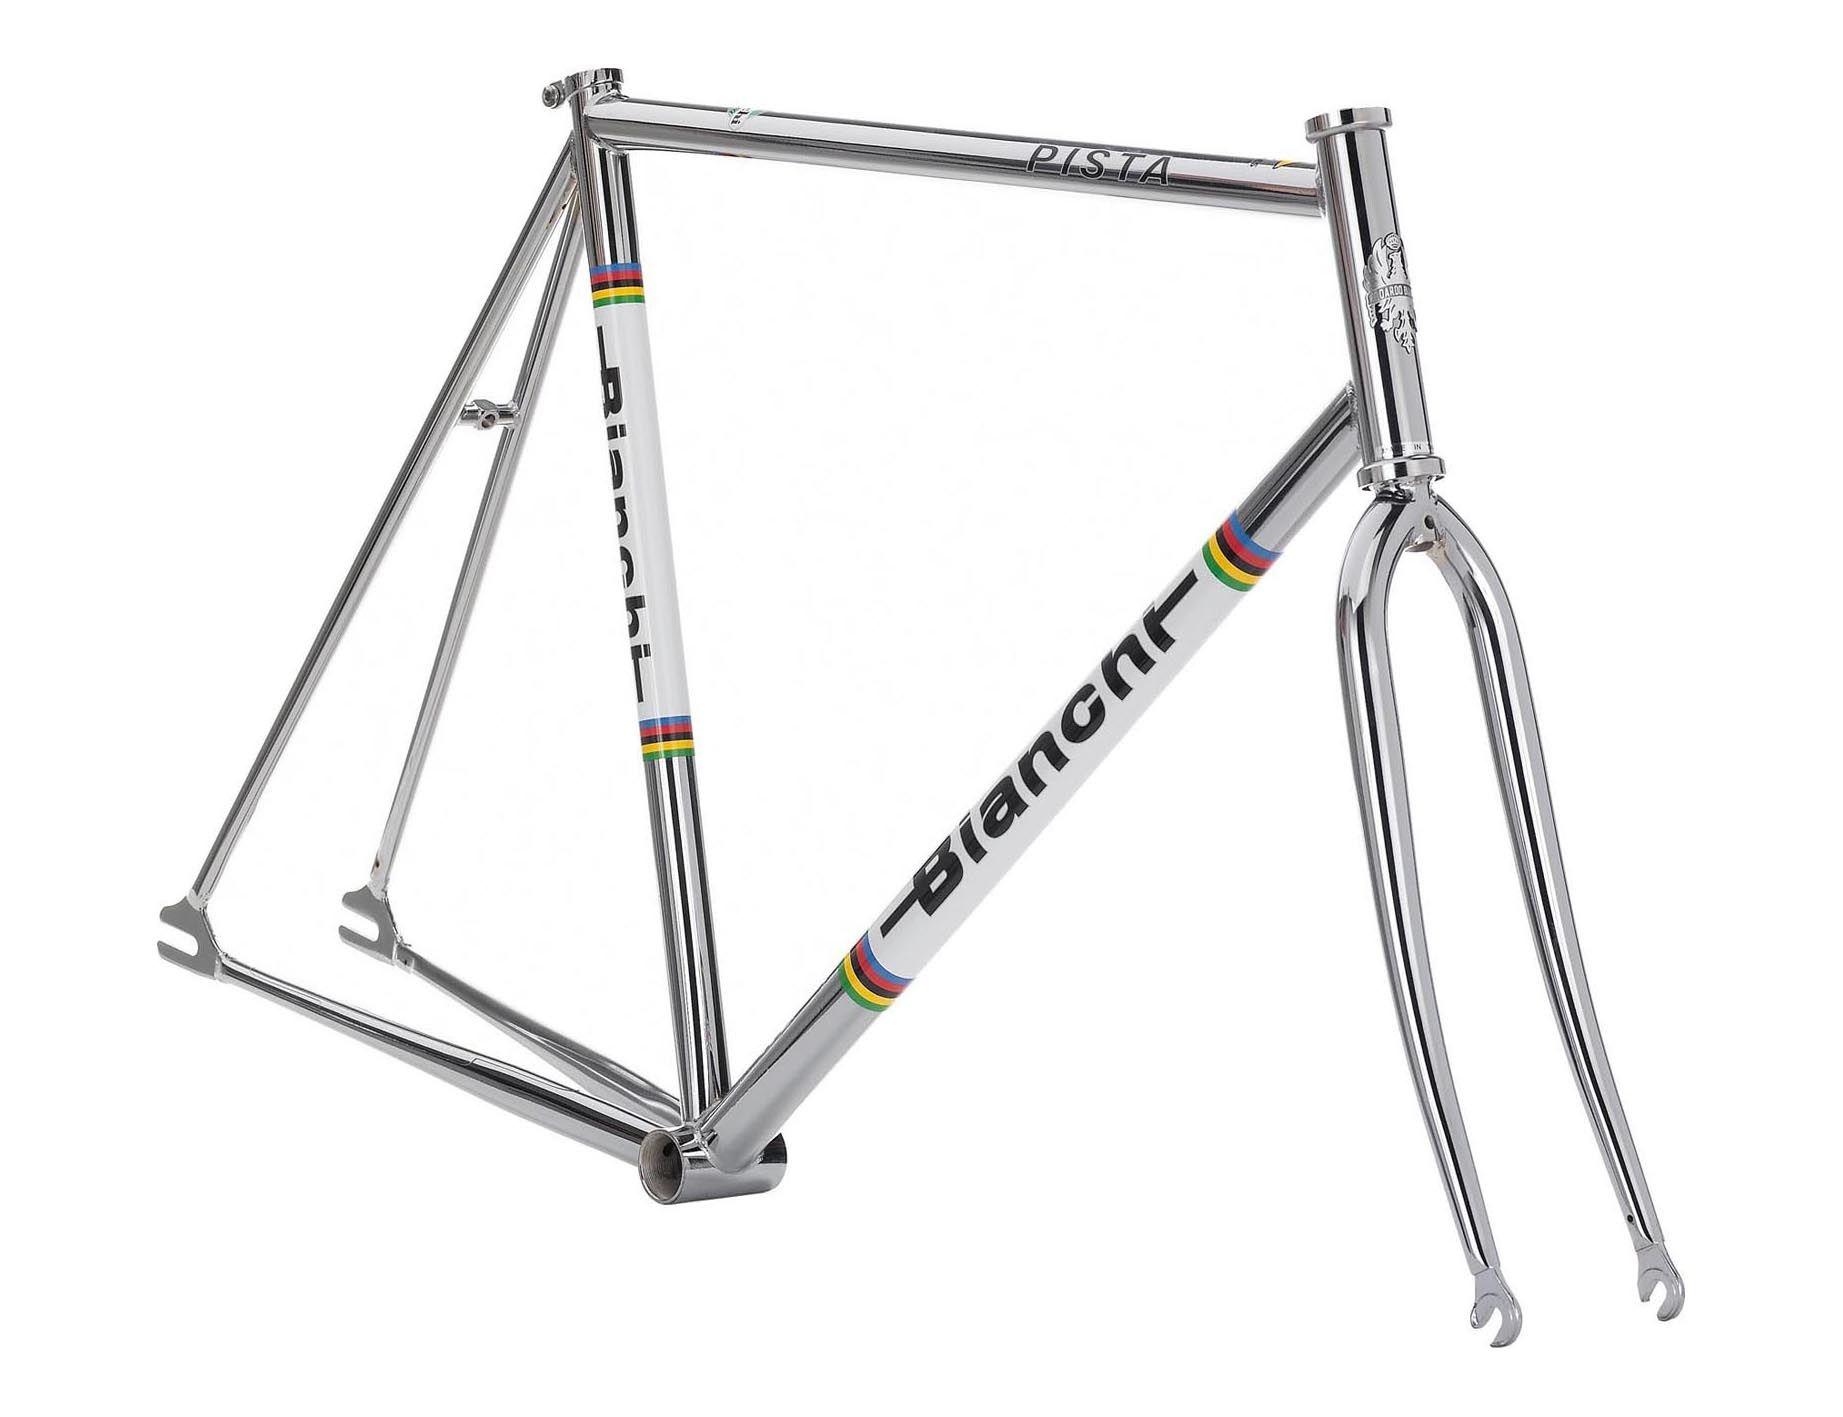 Bianchi Pista Steel Bike Details Bike